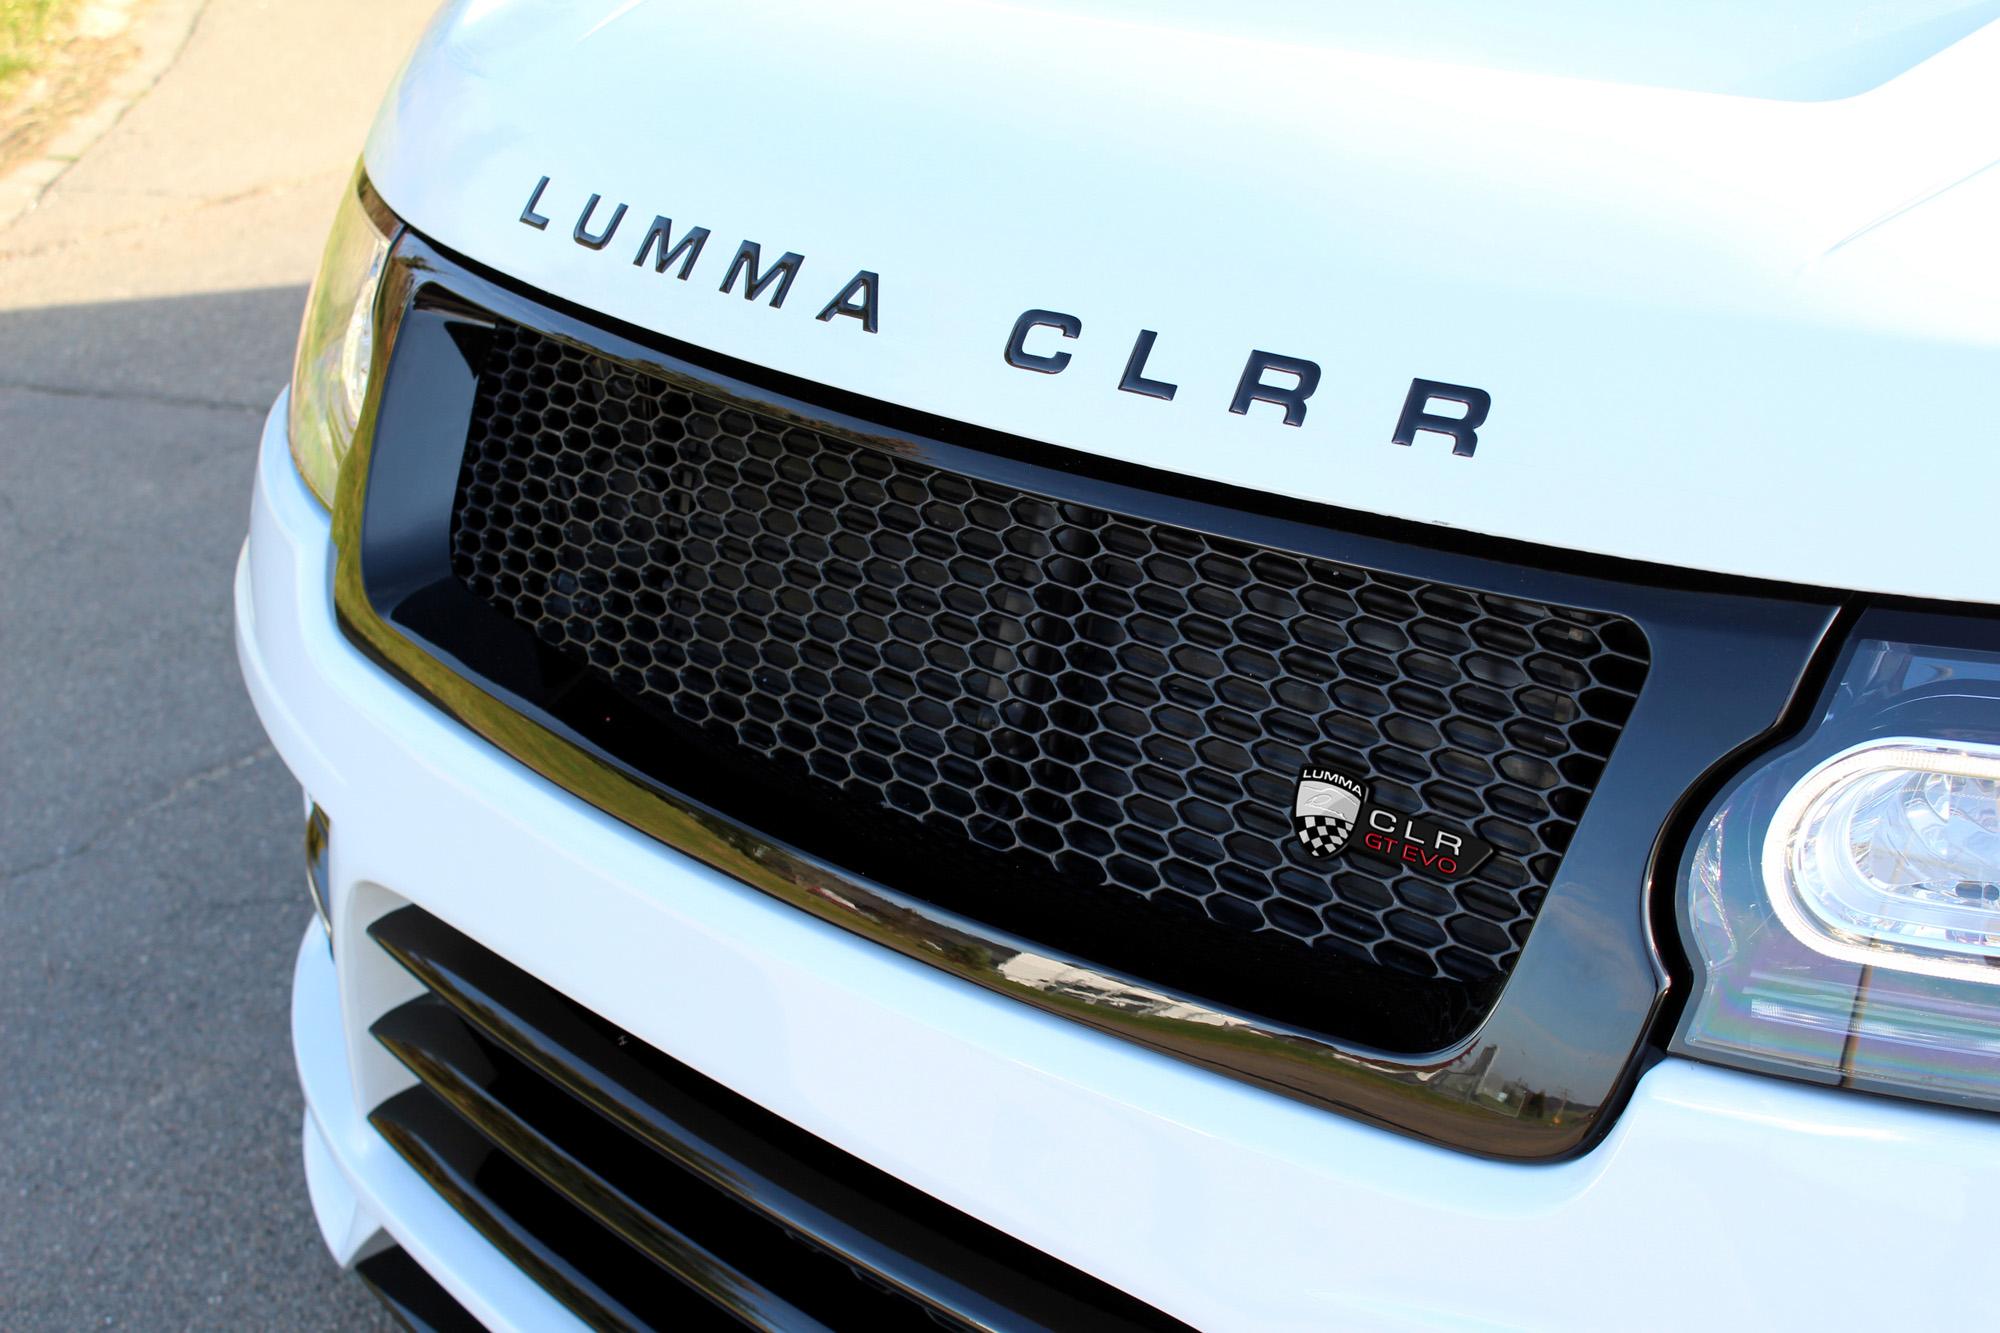 range-rover-lg-lumma-design-clr-r-gt-evo-007